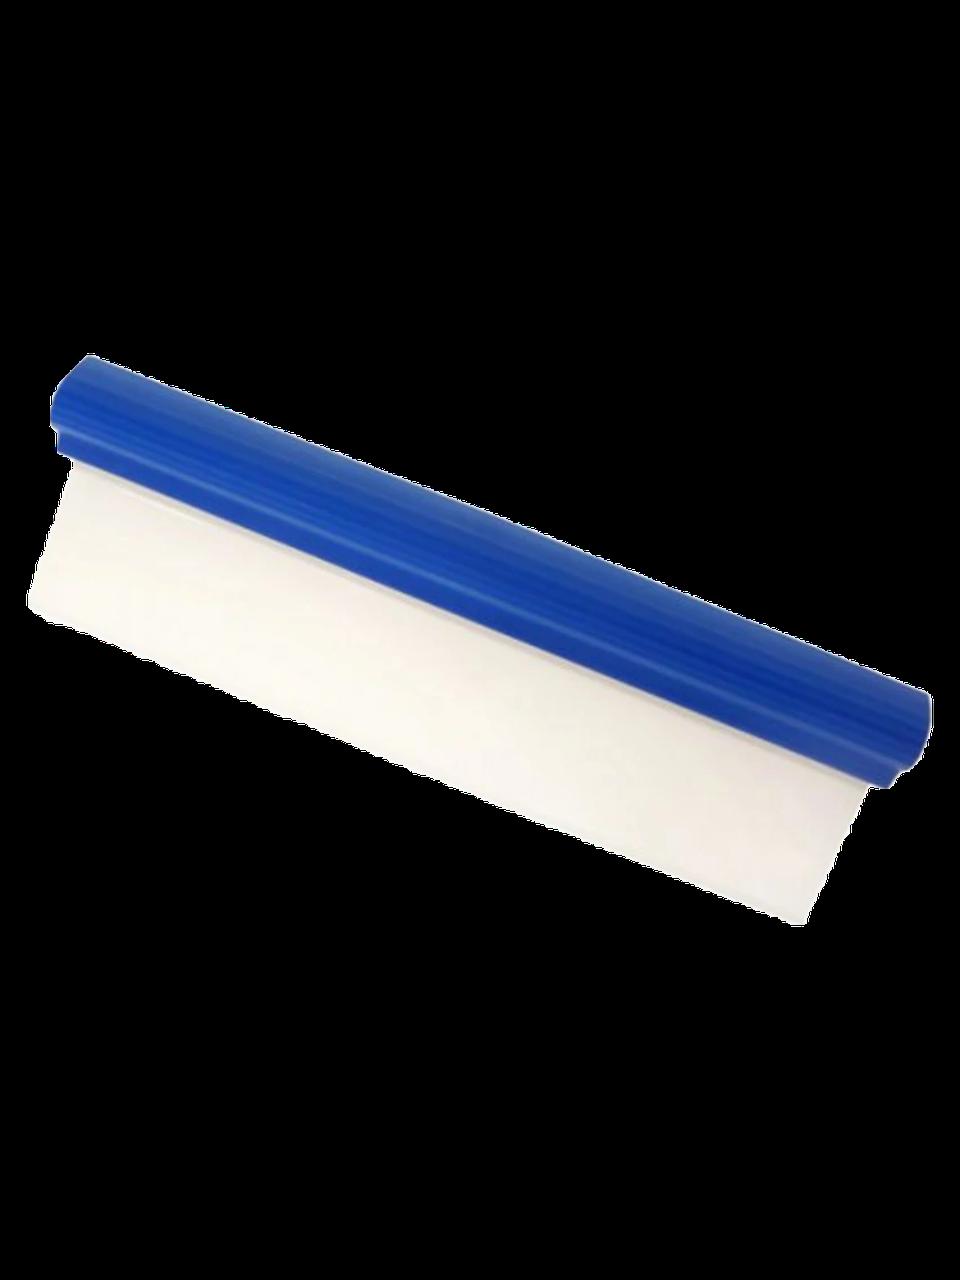 Щітка-скребок для згону води MASNER HIDRO-FLEXI BLADE